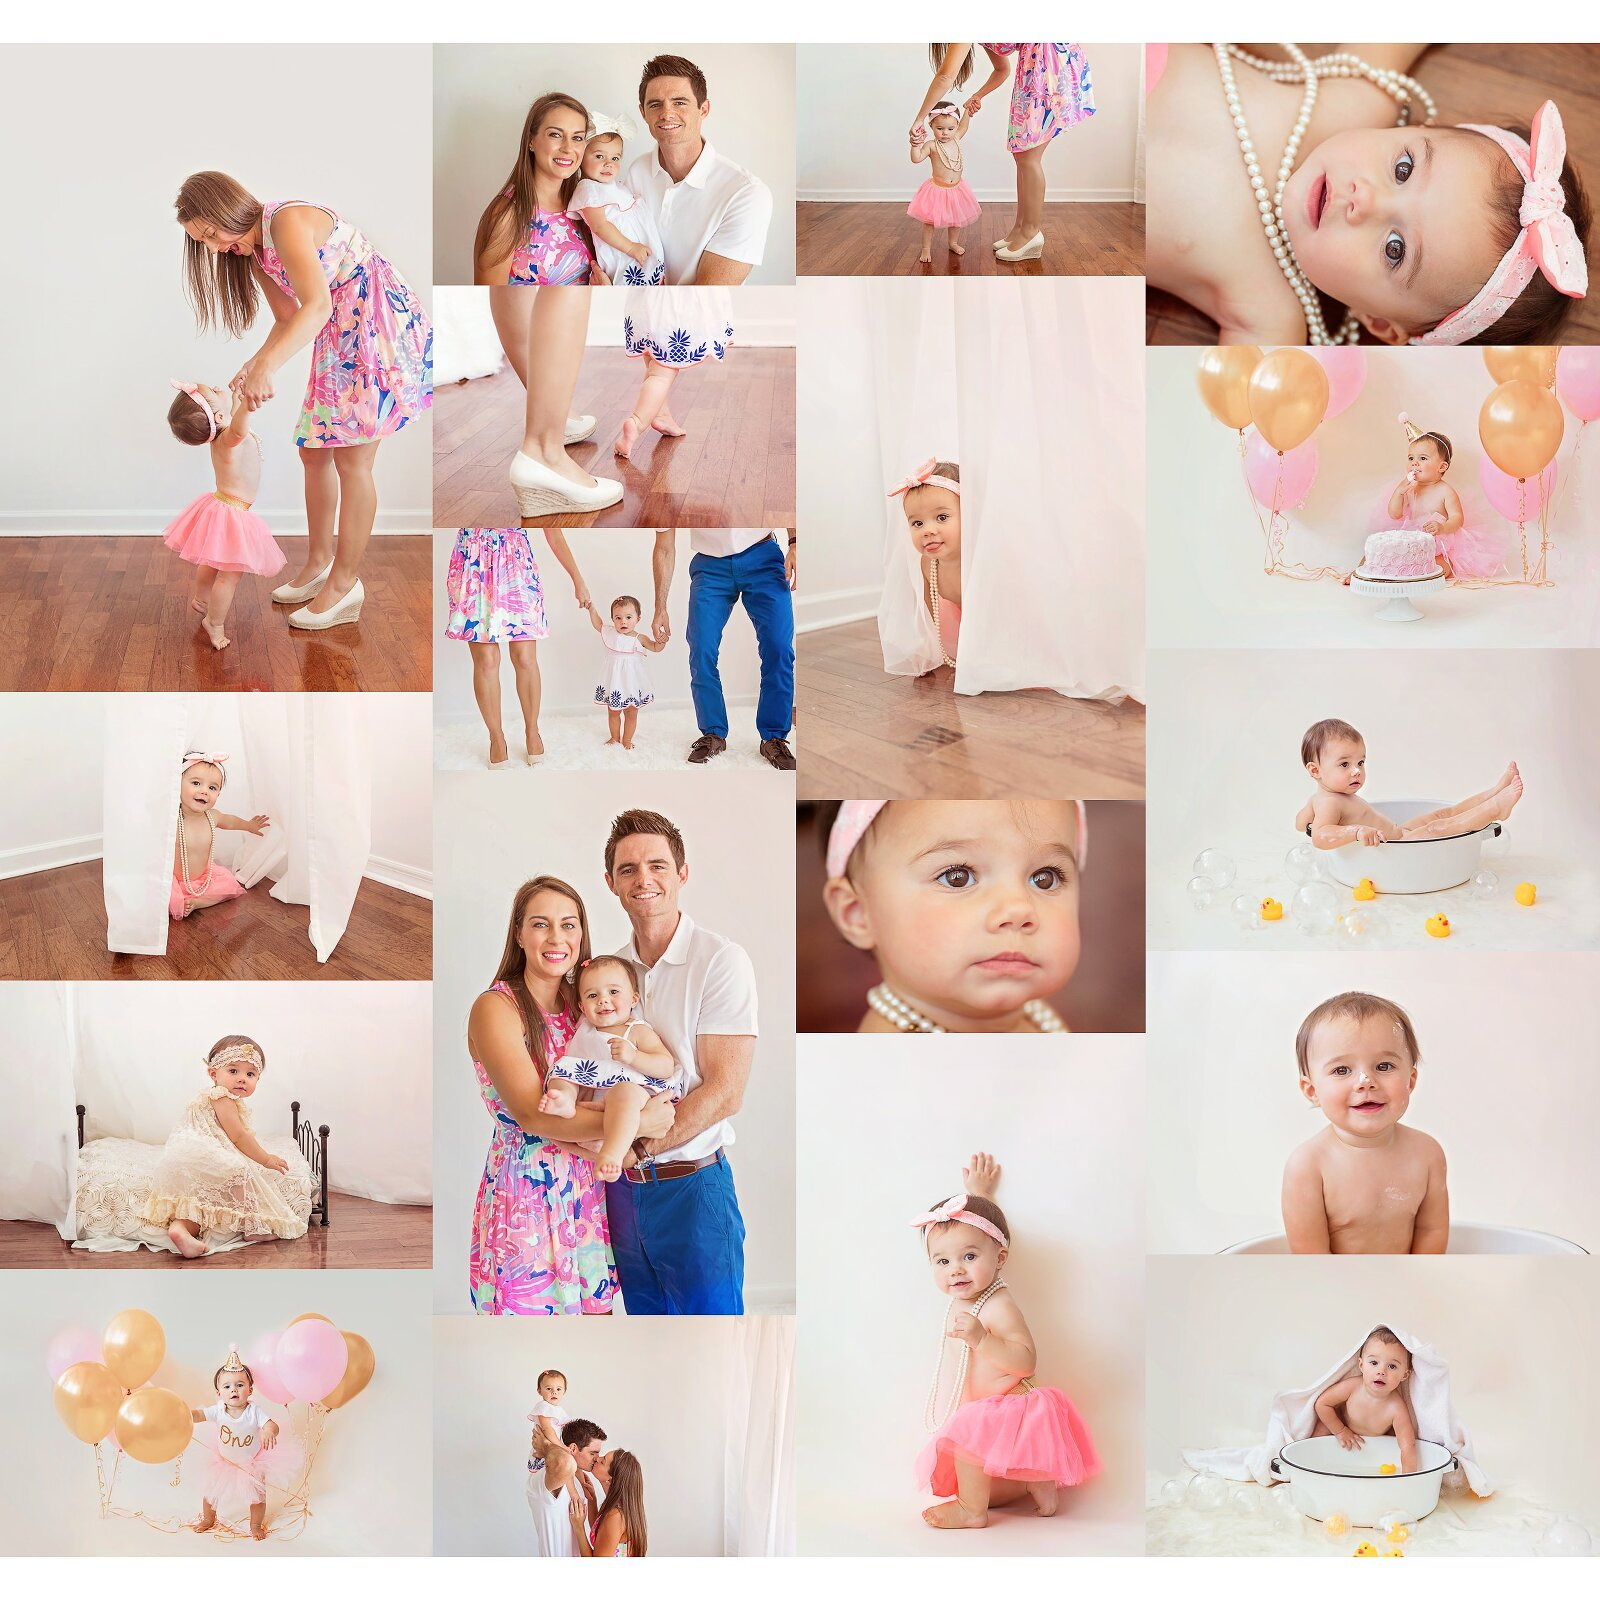 Fanciful Photography Baby Plan Photographer, Sarasota Baby Photographer, Cake-Smash photo session, Best Sarasota Baby Photographer